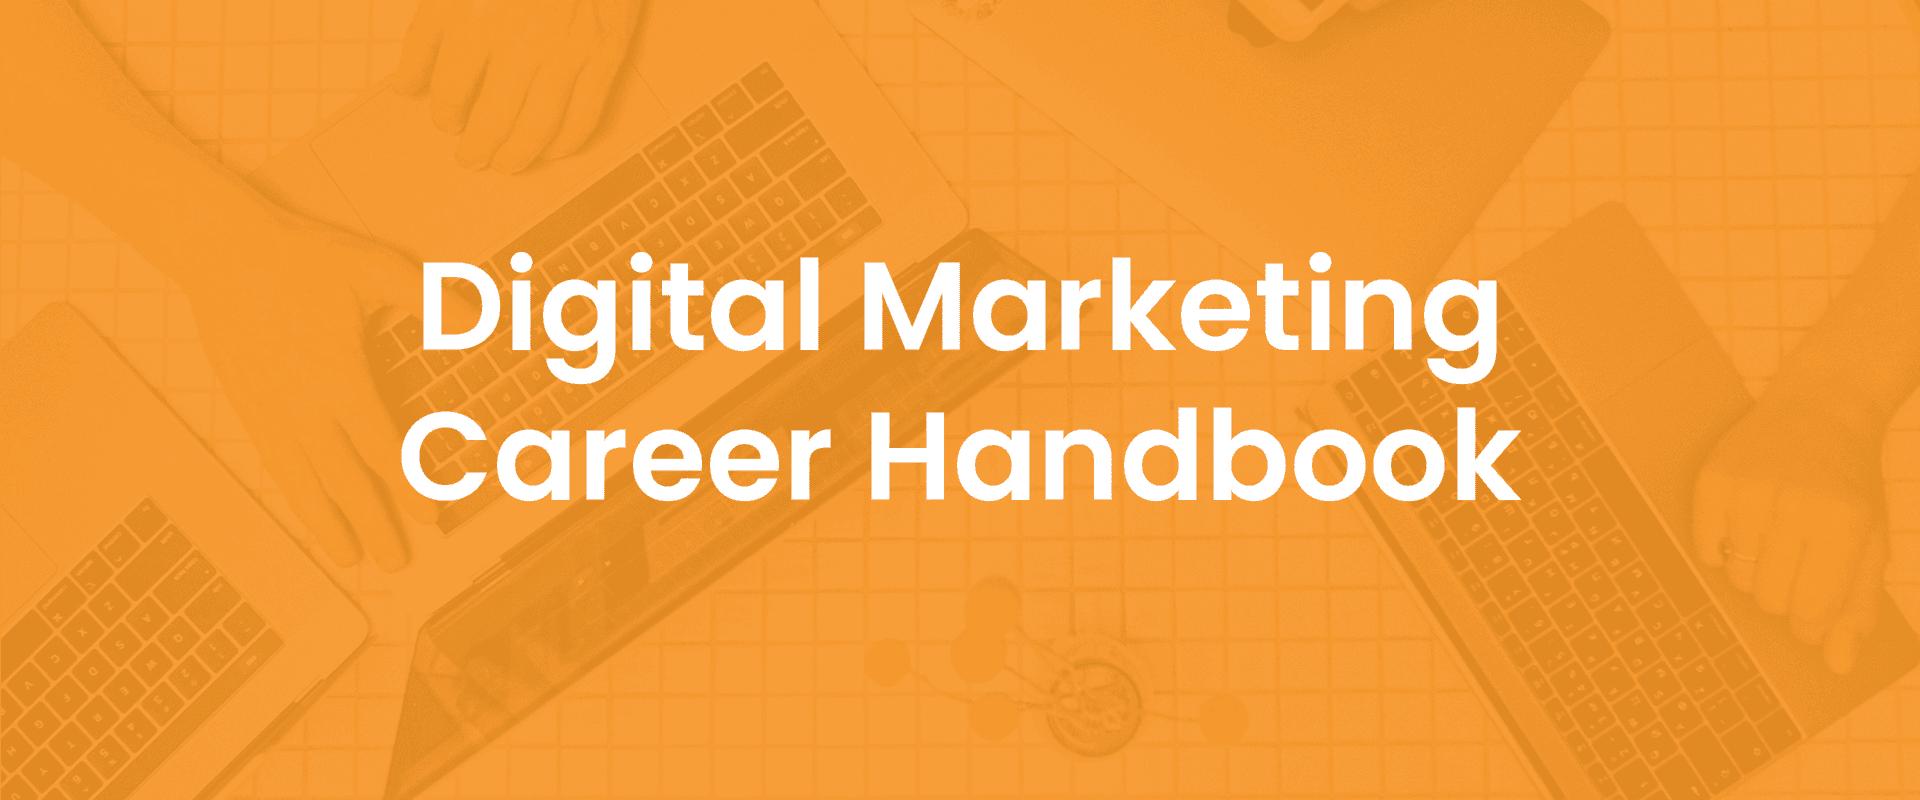 Digital Marketing Career Handbook Cover Image Resources